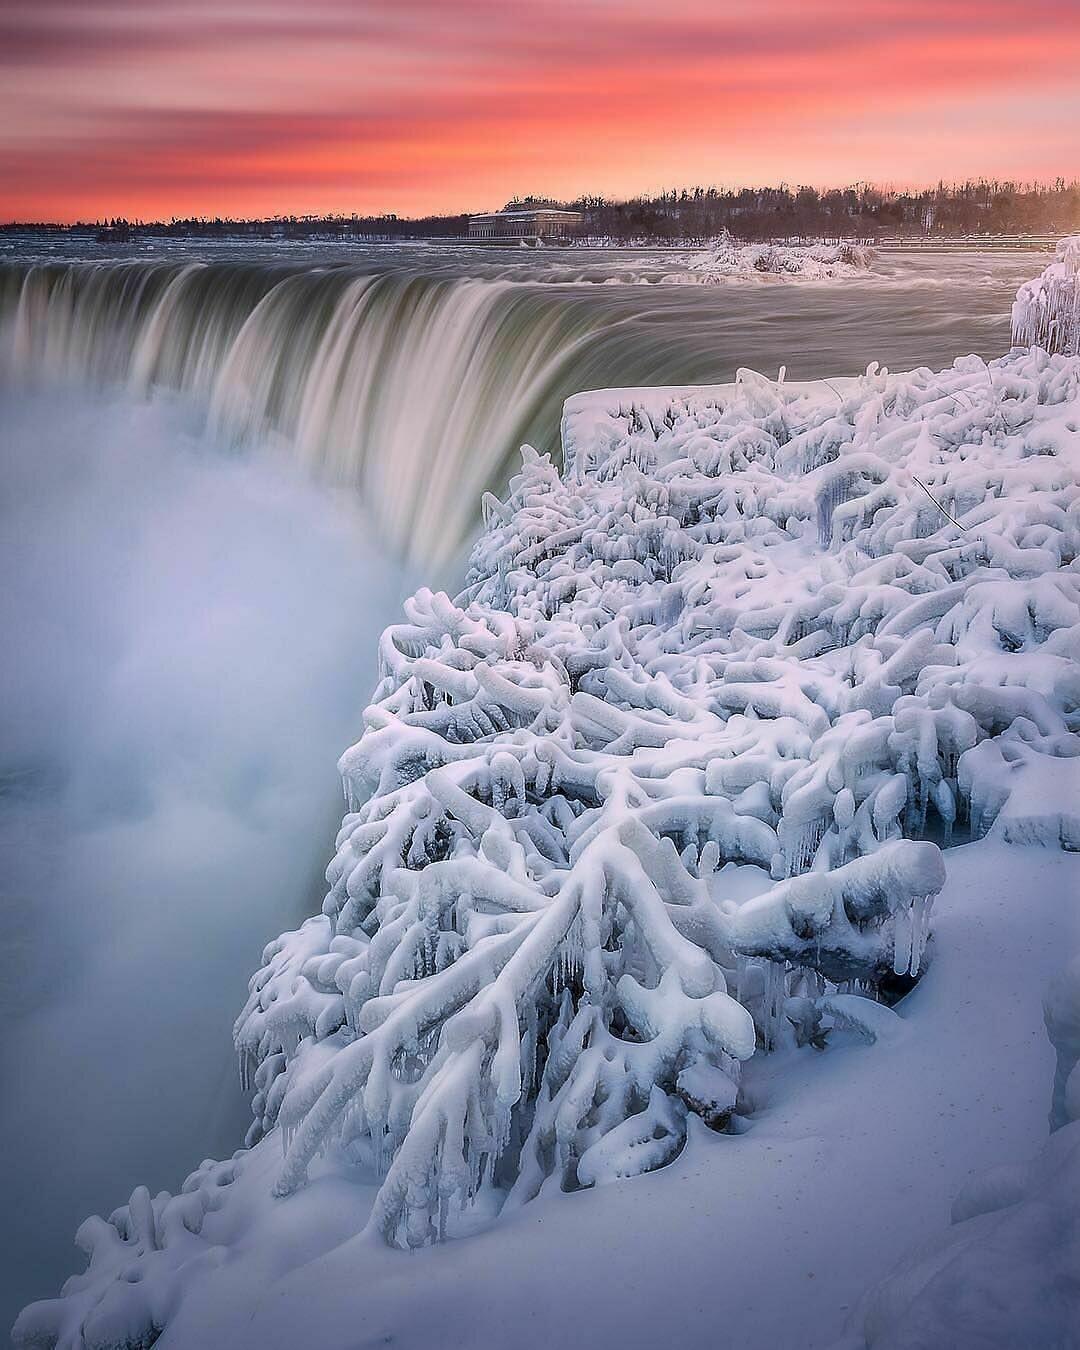 2020-03-28 Toronto & Niagara Falls [2 days]